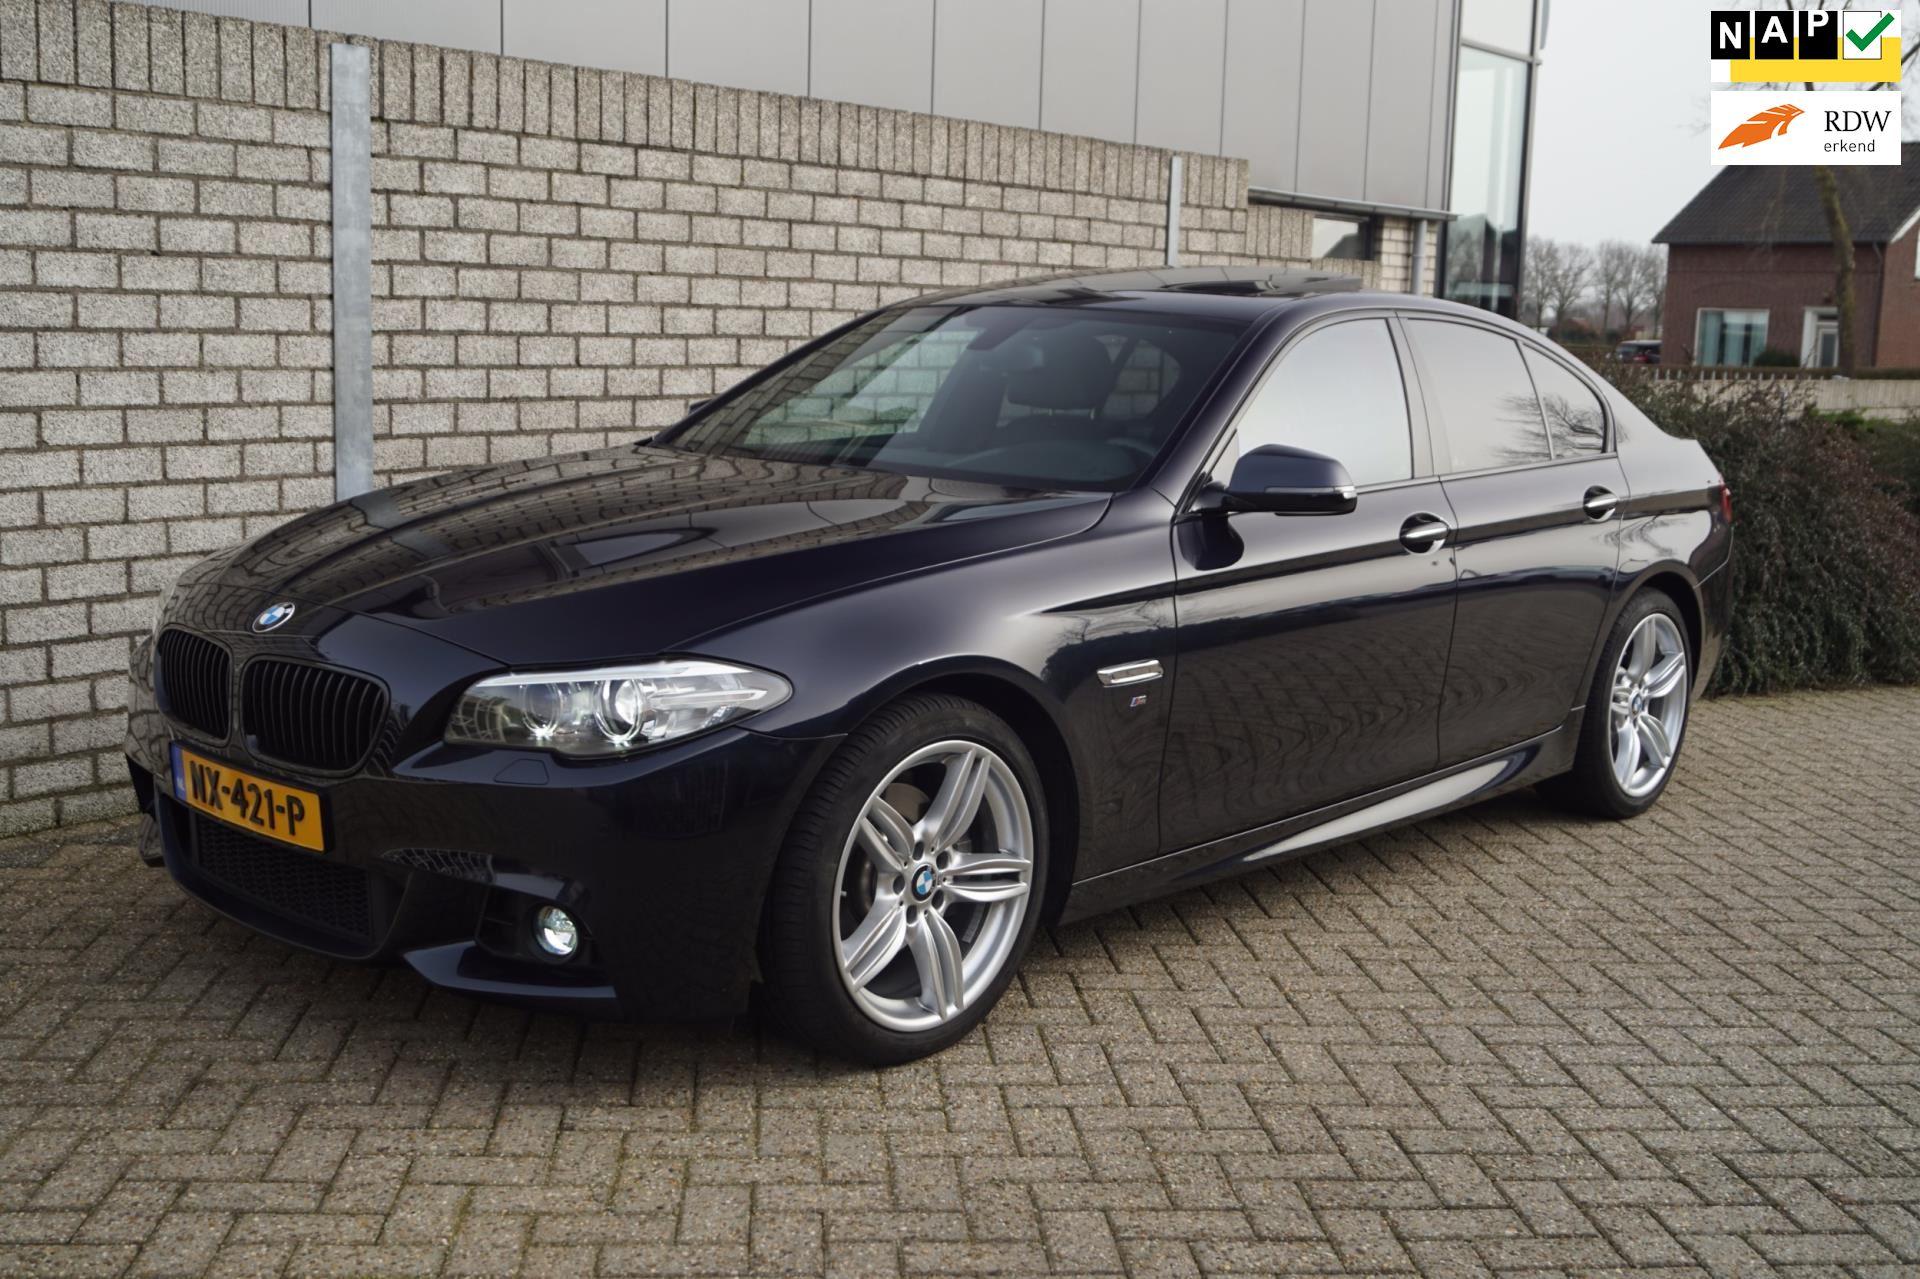 BMW 5-serie occasion - Autobedrijf H. Wijdeven V.o.f.